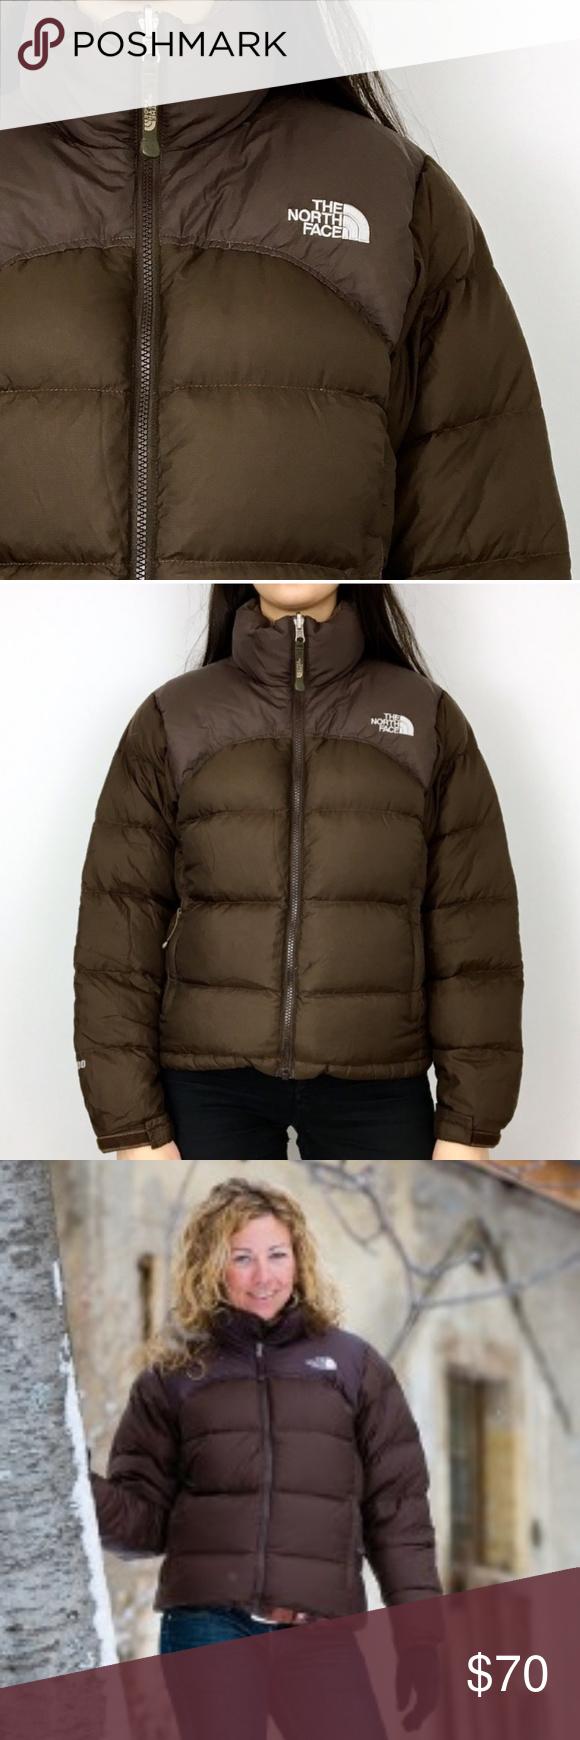 Chocolate Brown North Face 700 Series Jacket Brown North Face North Face Jacket Jackets [ 1740 x 580 Pixel ]